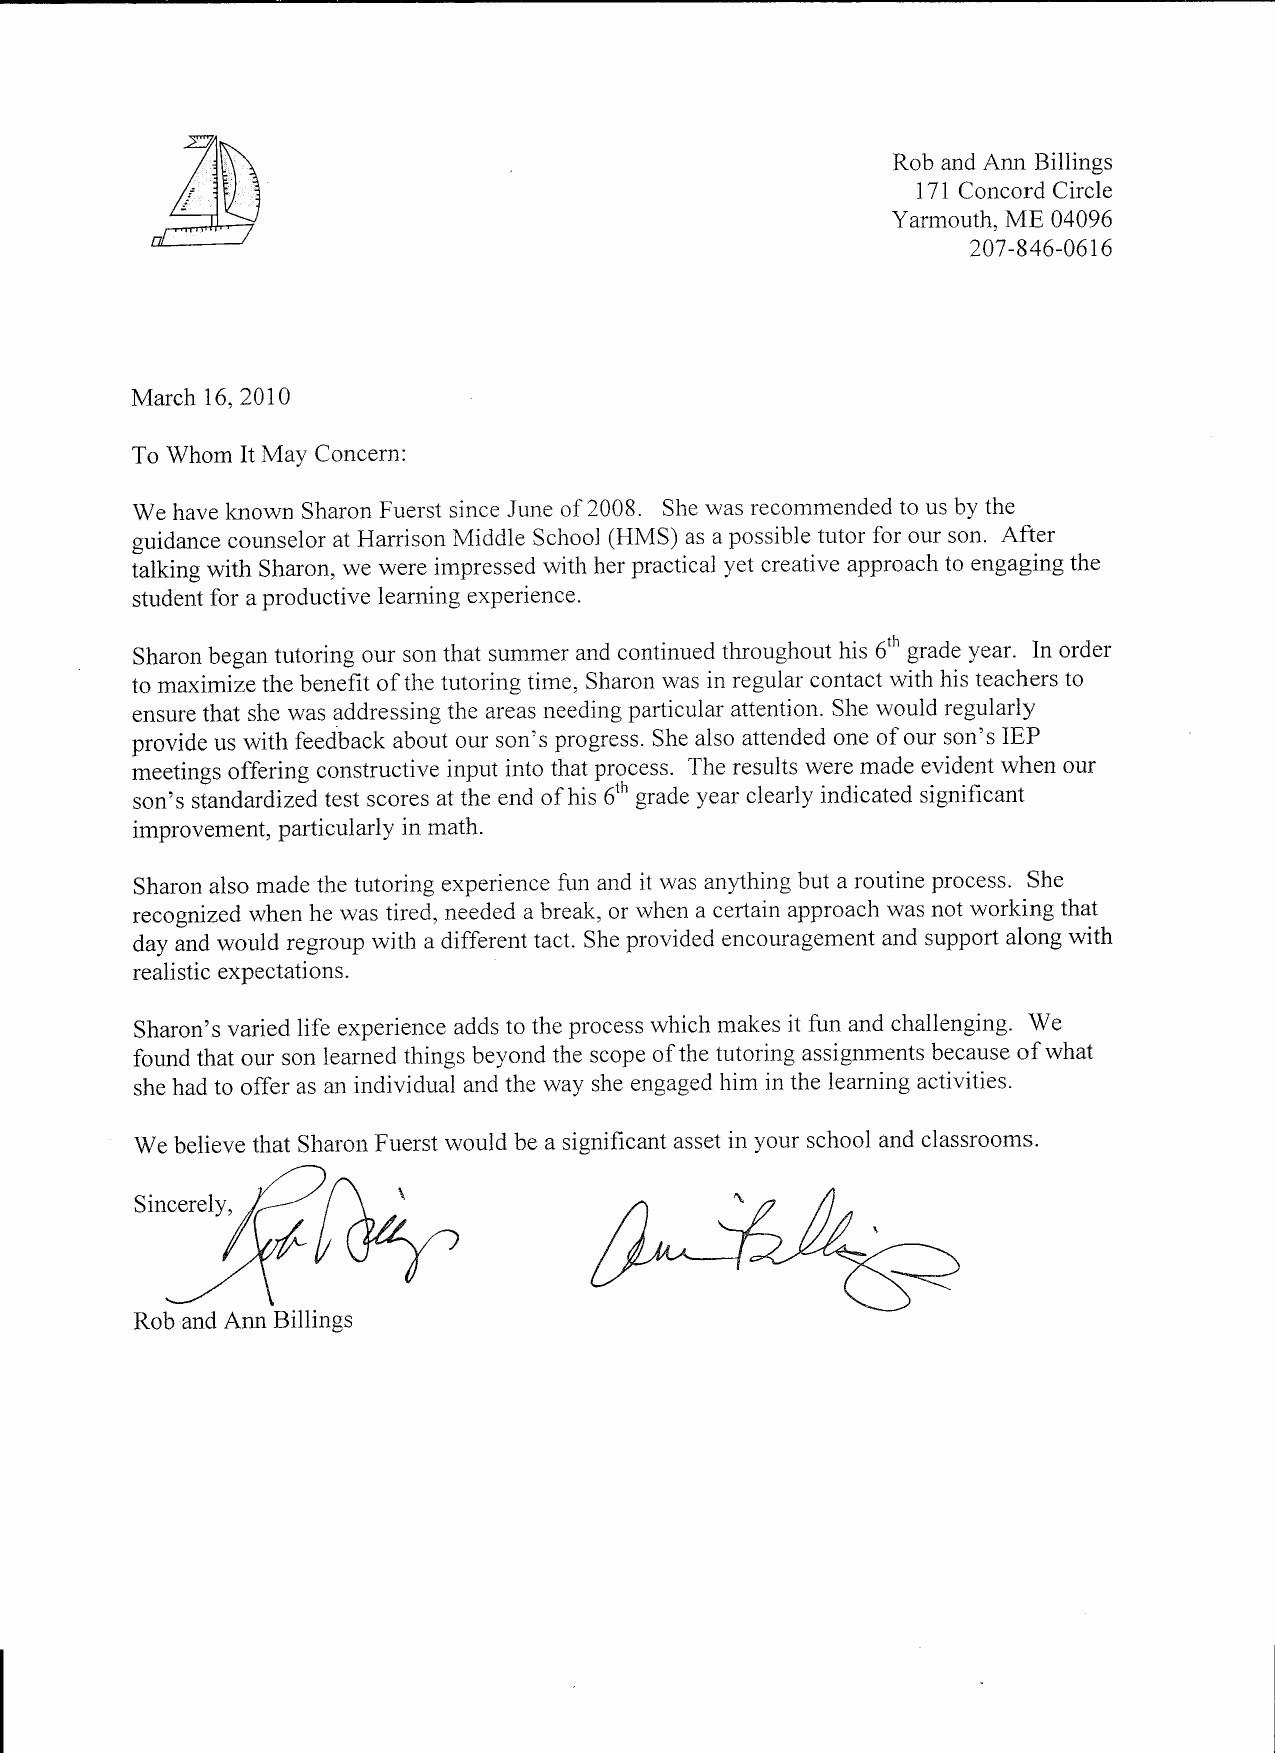 Recommendation Letter Template for Teacher Luxury Teacher Re Mendation Letter Help Stonewall Services